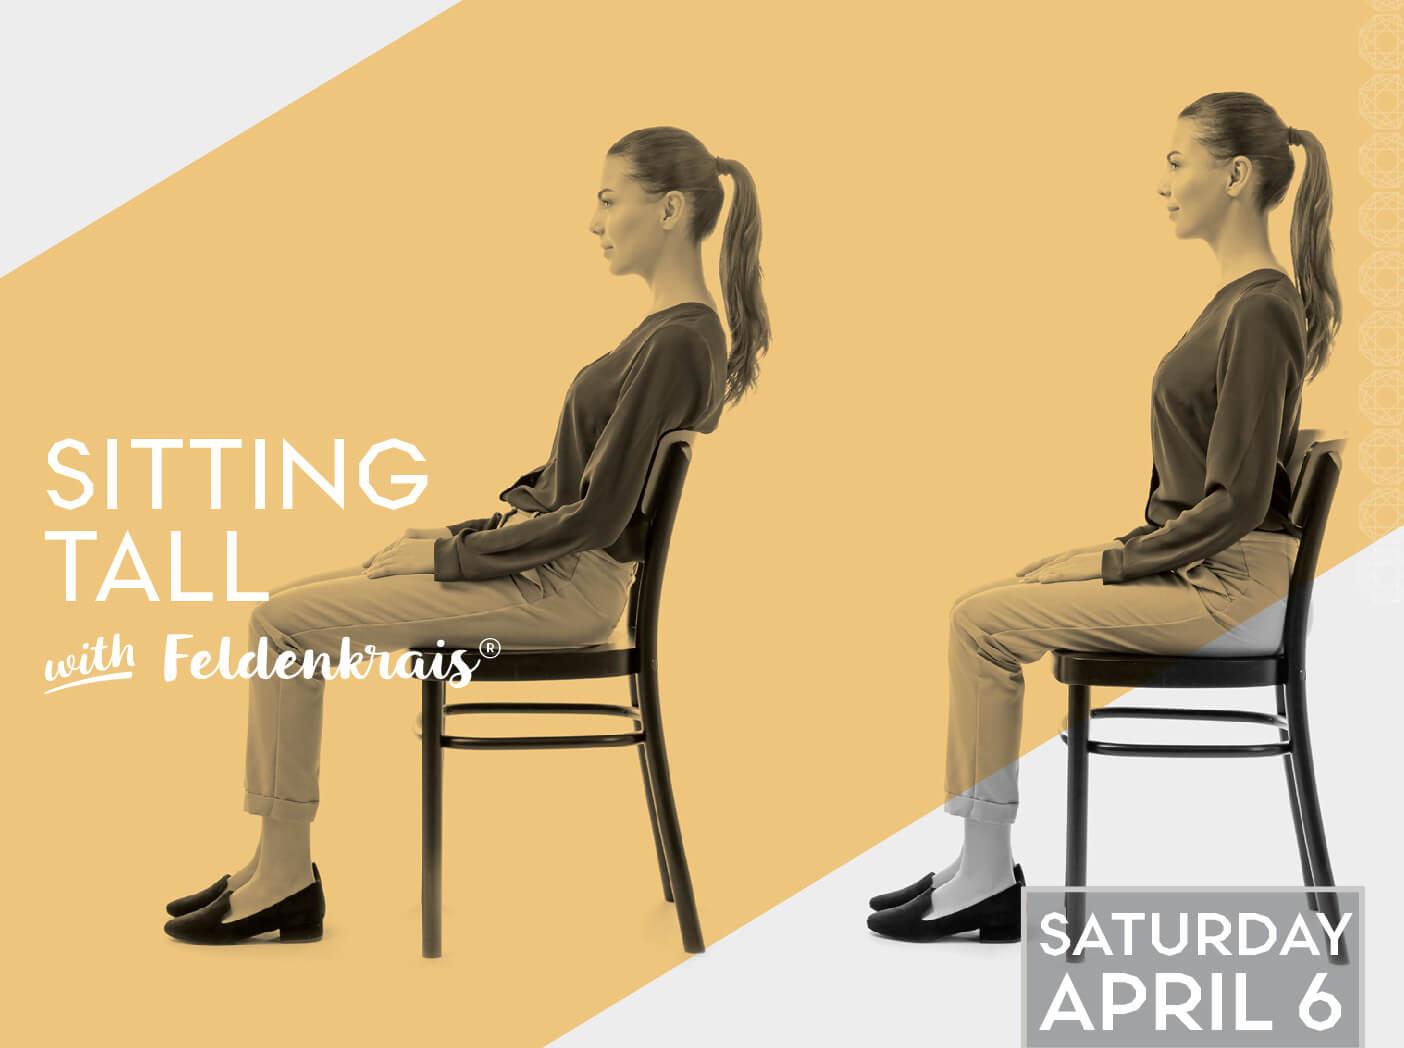 Sitting Tall with Feldenkrais®: Weekend Workshop